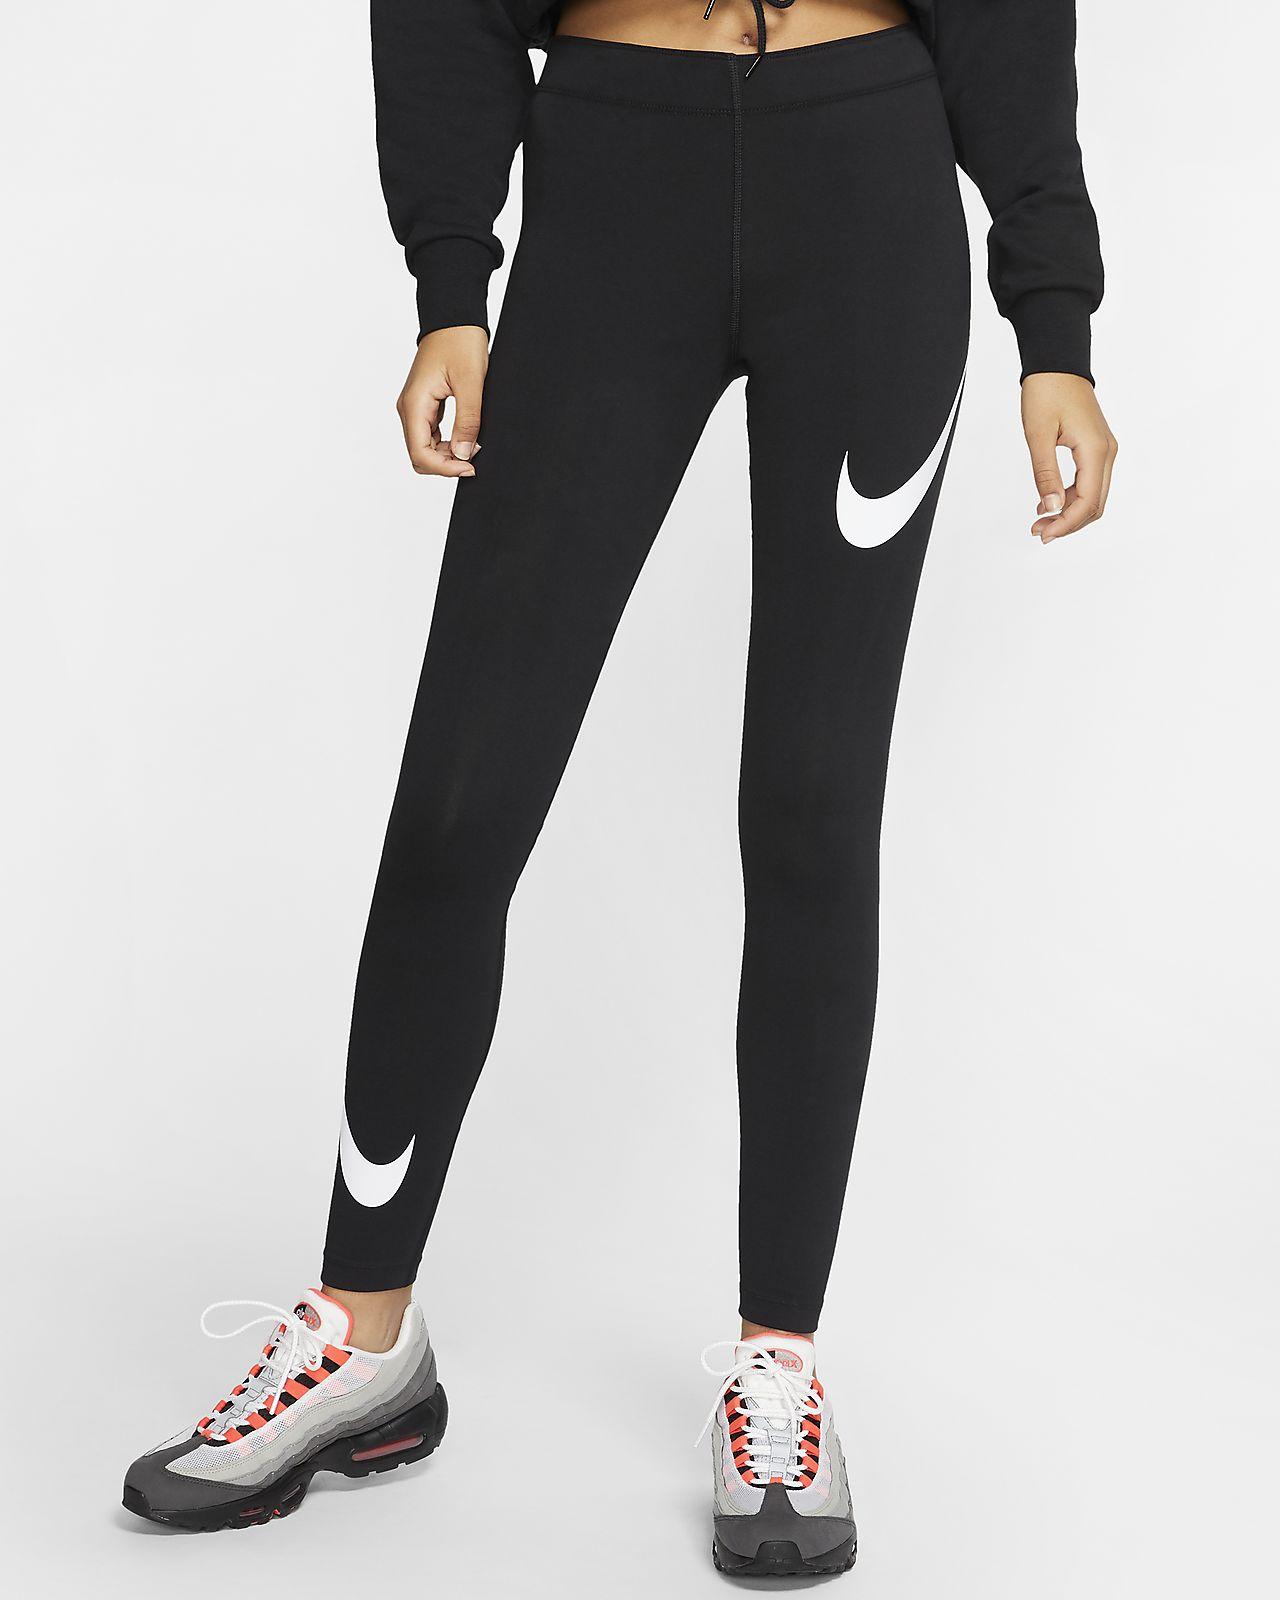 Nike Sportswear Leg-A-See Swoosh 女子紧身裤